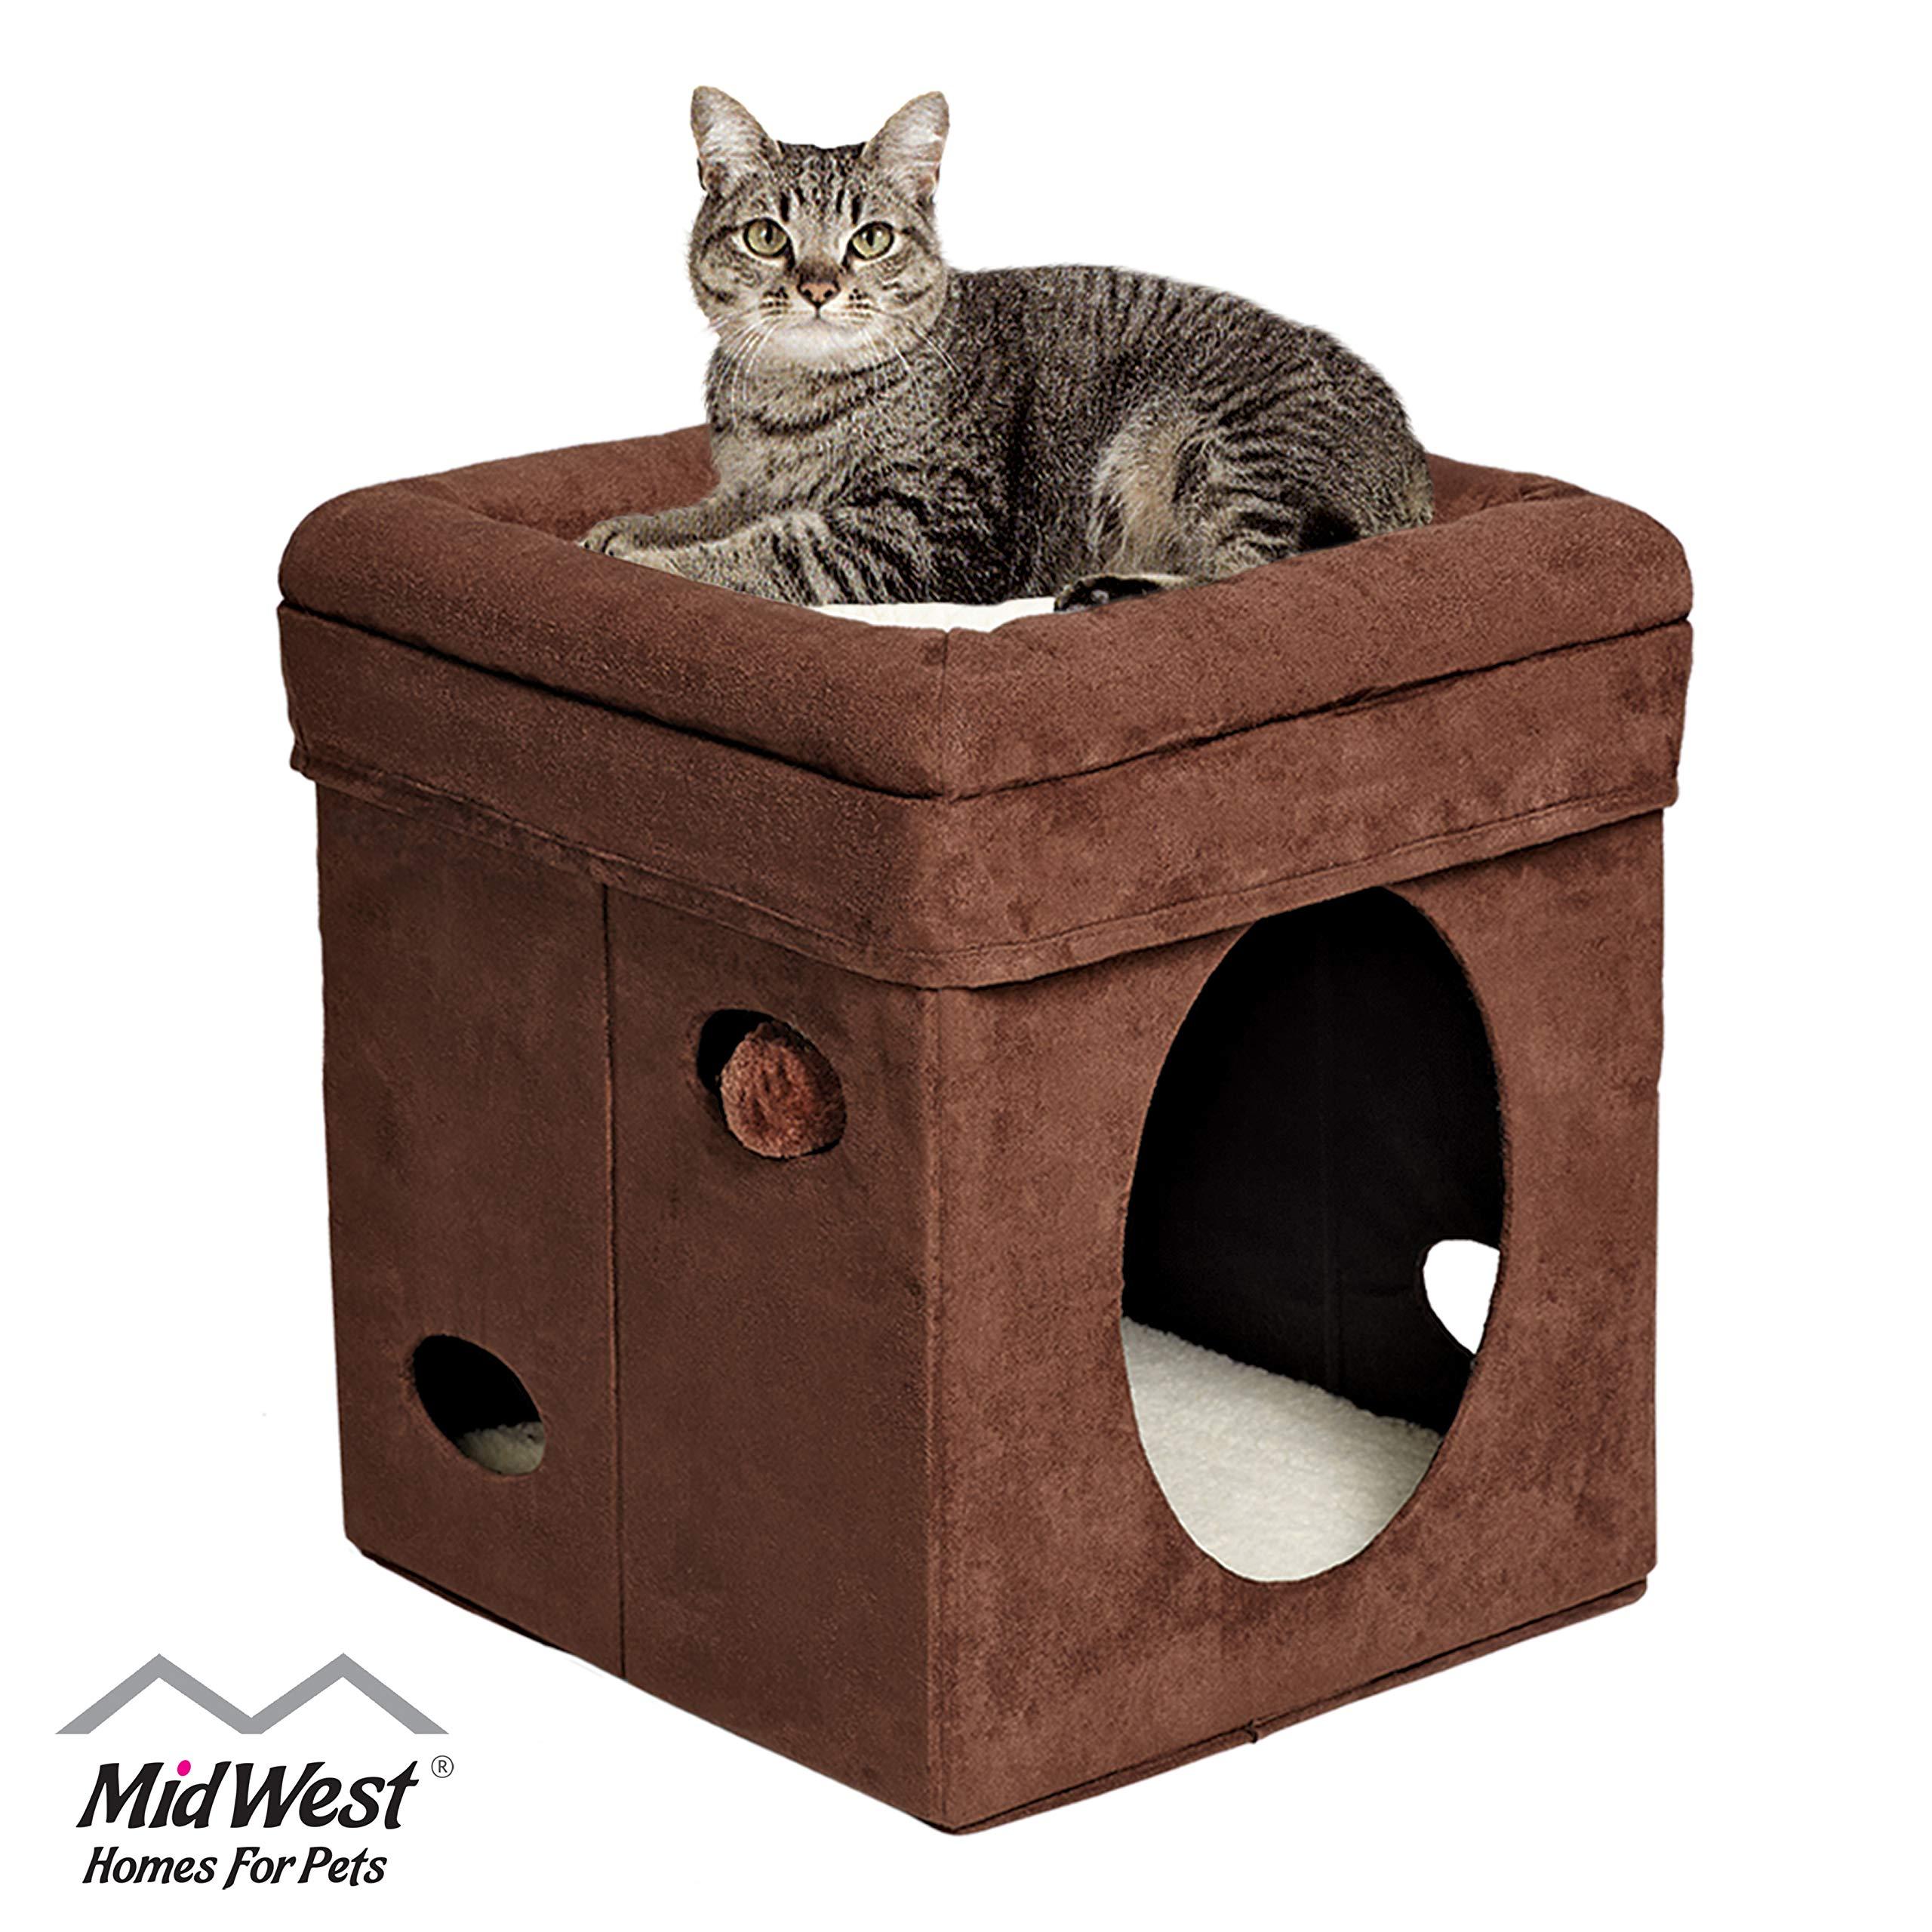 MidWest Curious Cat Cube, Cat House / Cat Condo